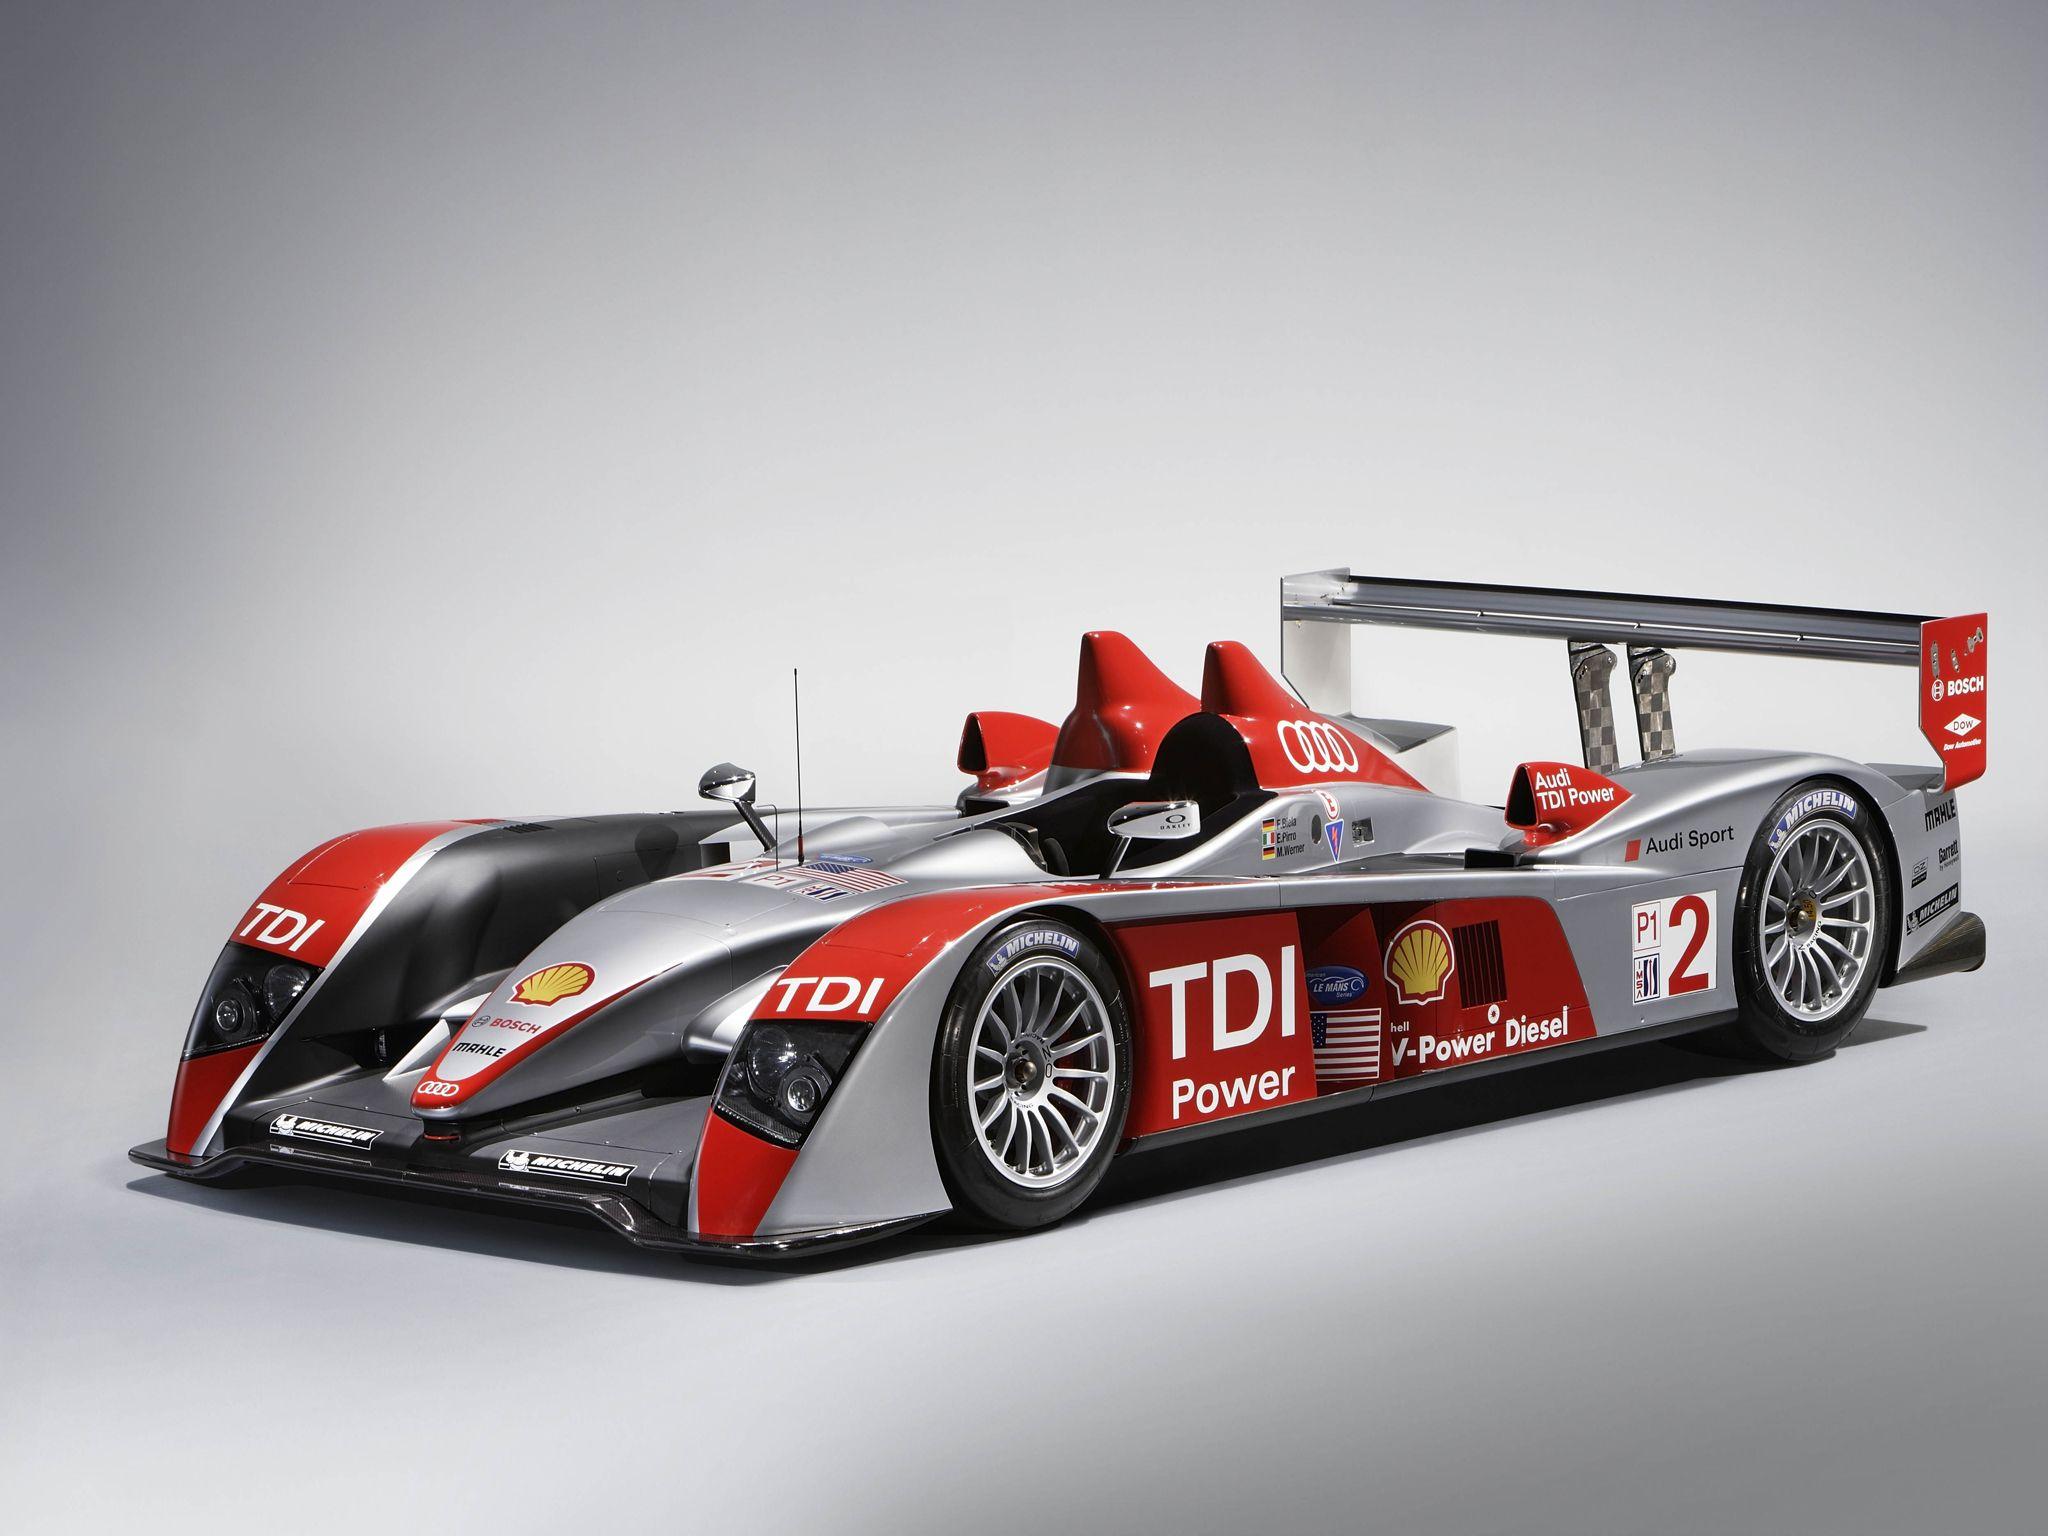 Kelebihan Kekurangan Audi R10 Murah Berkualitas